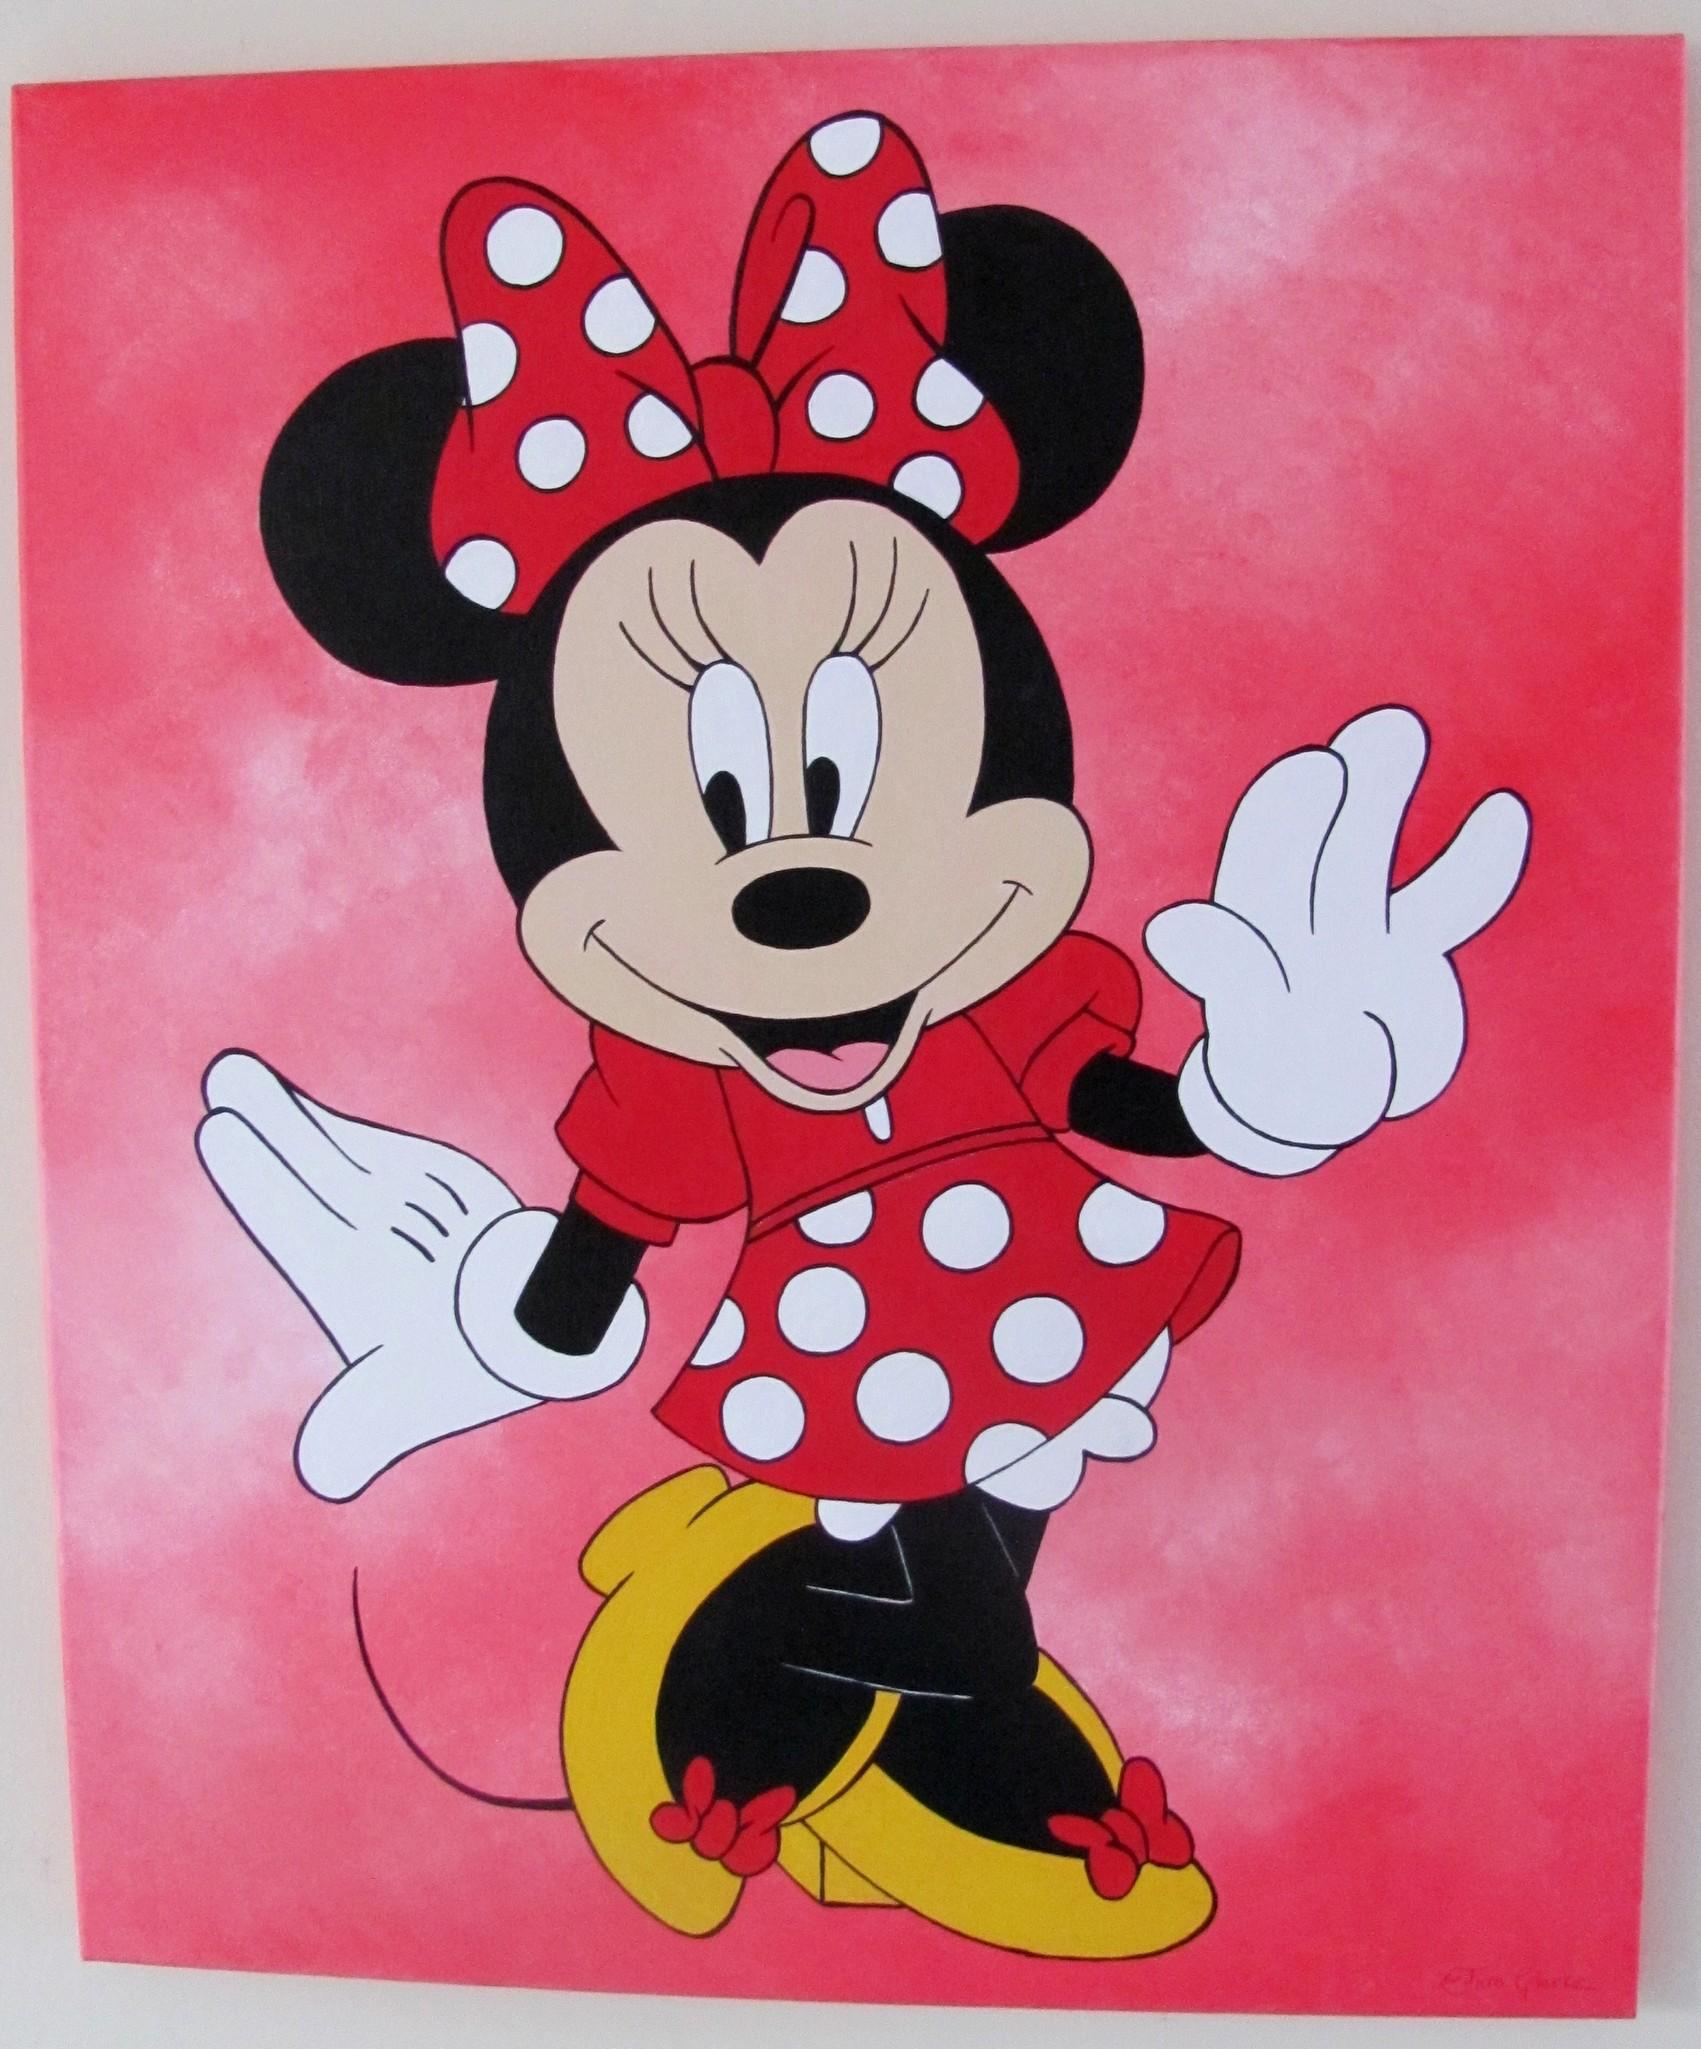 Minnie mouse wallpapers - Fotos de minnie mouse ...